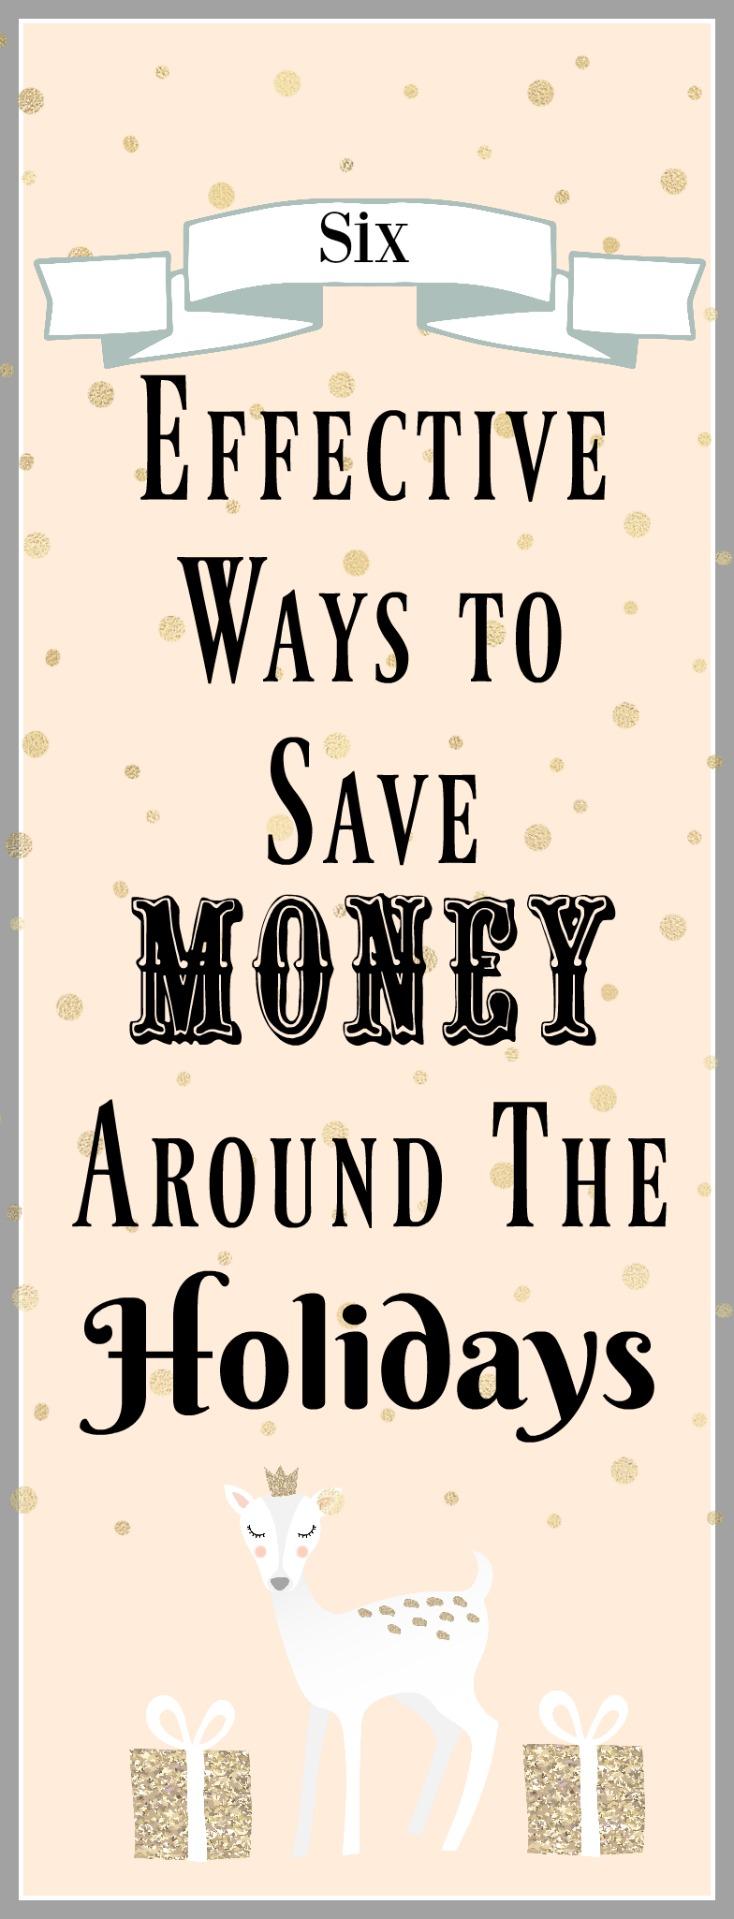 6 effective ways to save money around the holidays on chemistrycachet.com